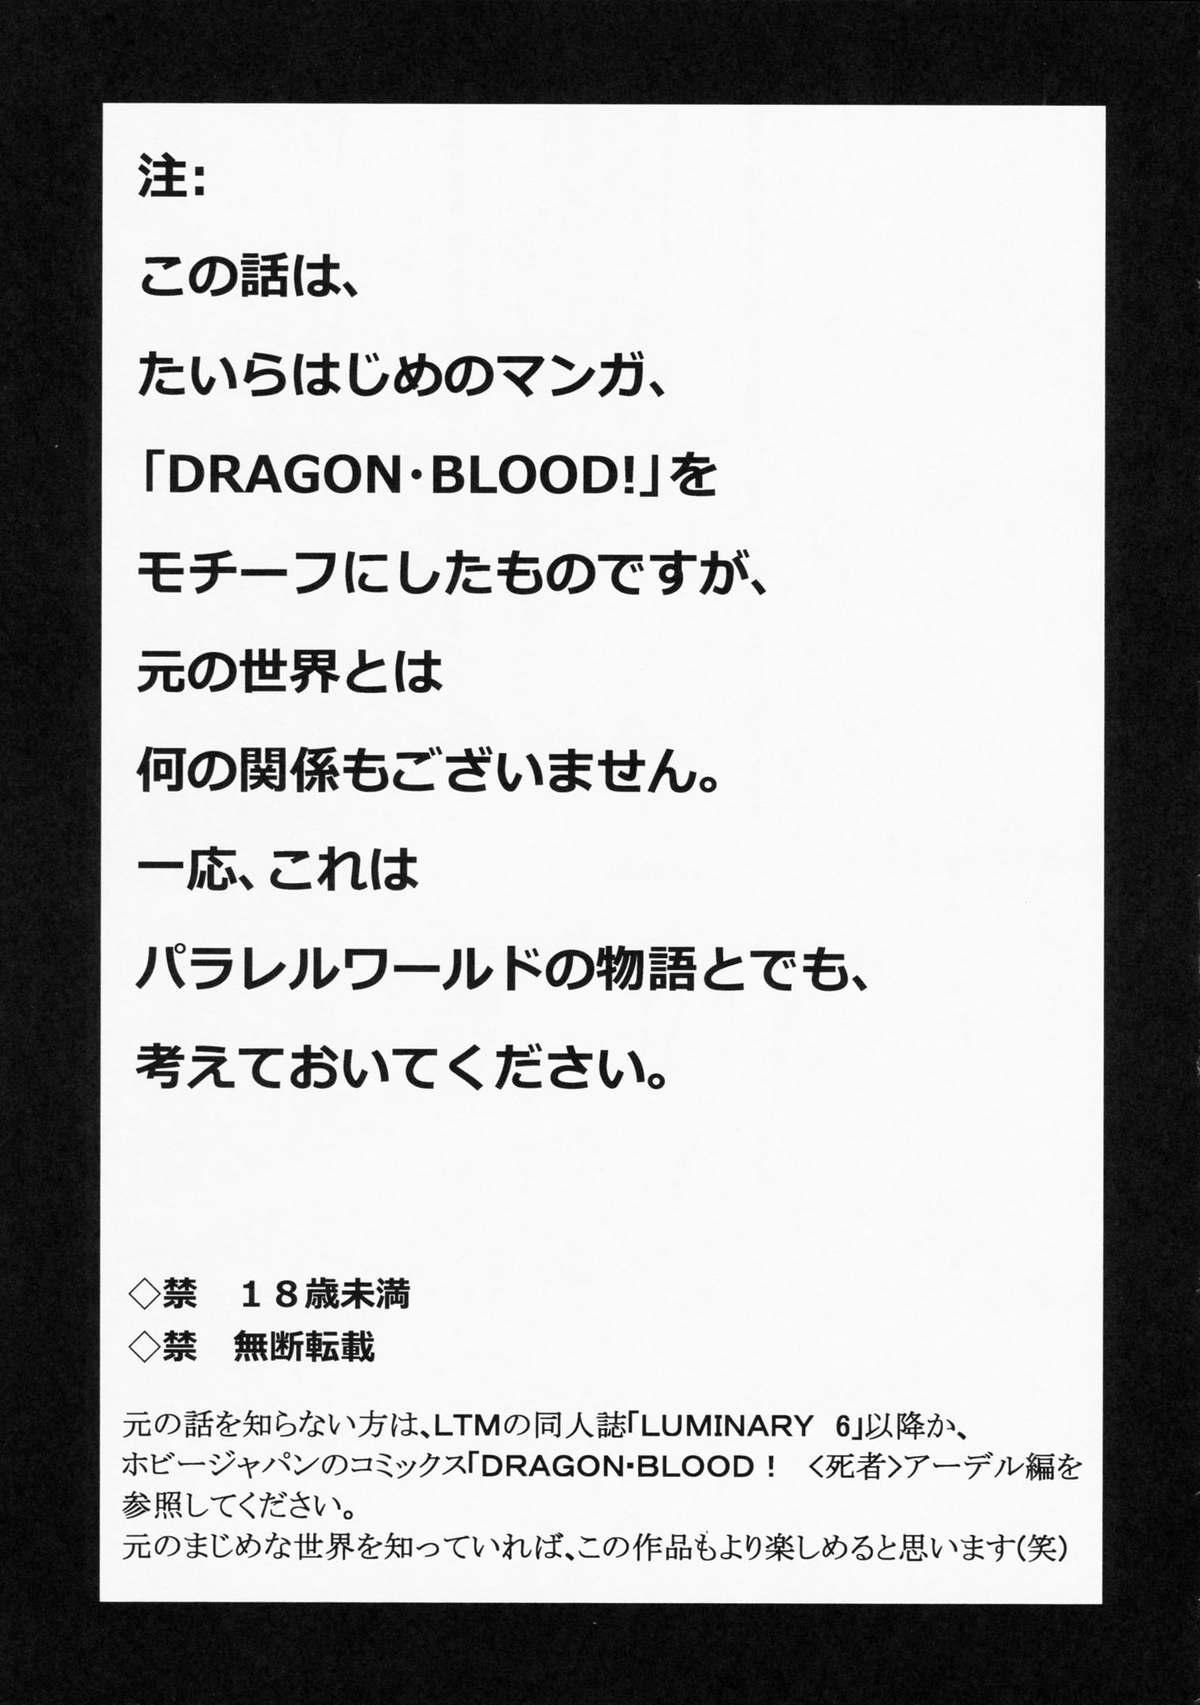 Nise Dragon Blood! 21 4